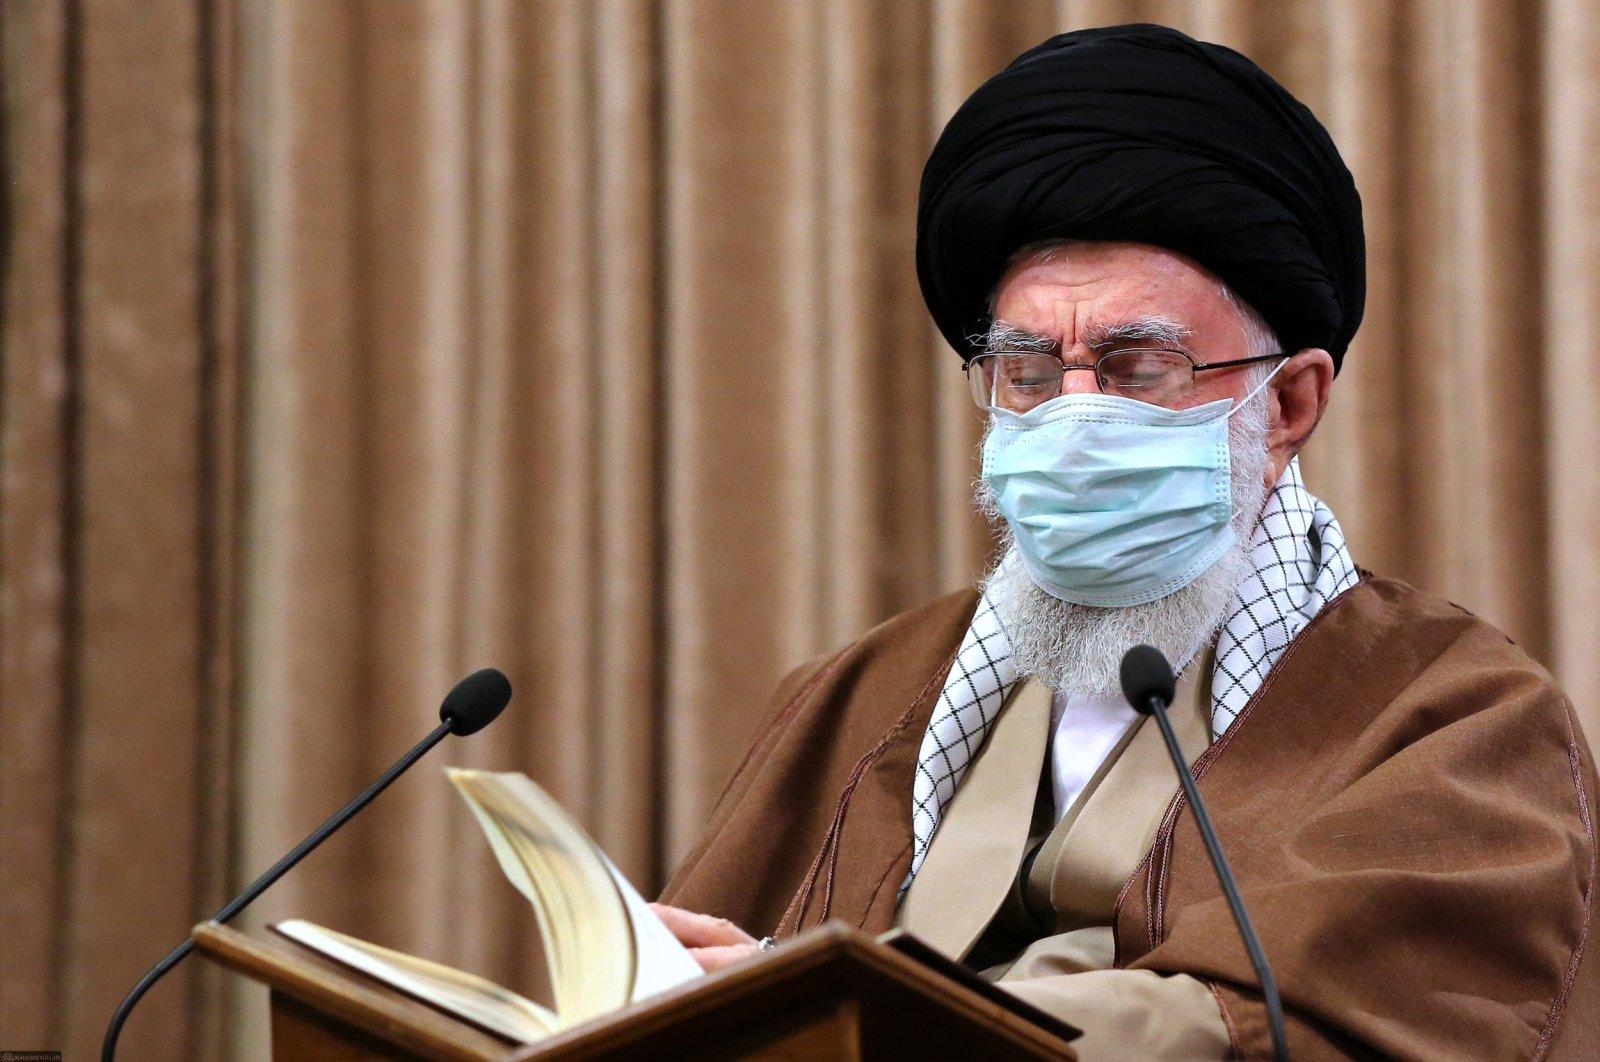 Iran's Supreme Leader Ayatollah Ali Khamenei attends a Quran Recitation Ceremony on the first day of the Muslim holy month of Ramadan in Iran, on April 14, 2021. (KHAMENEI.IR via AFP)